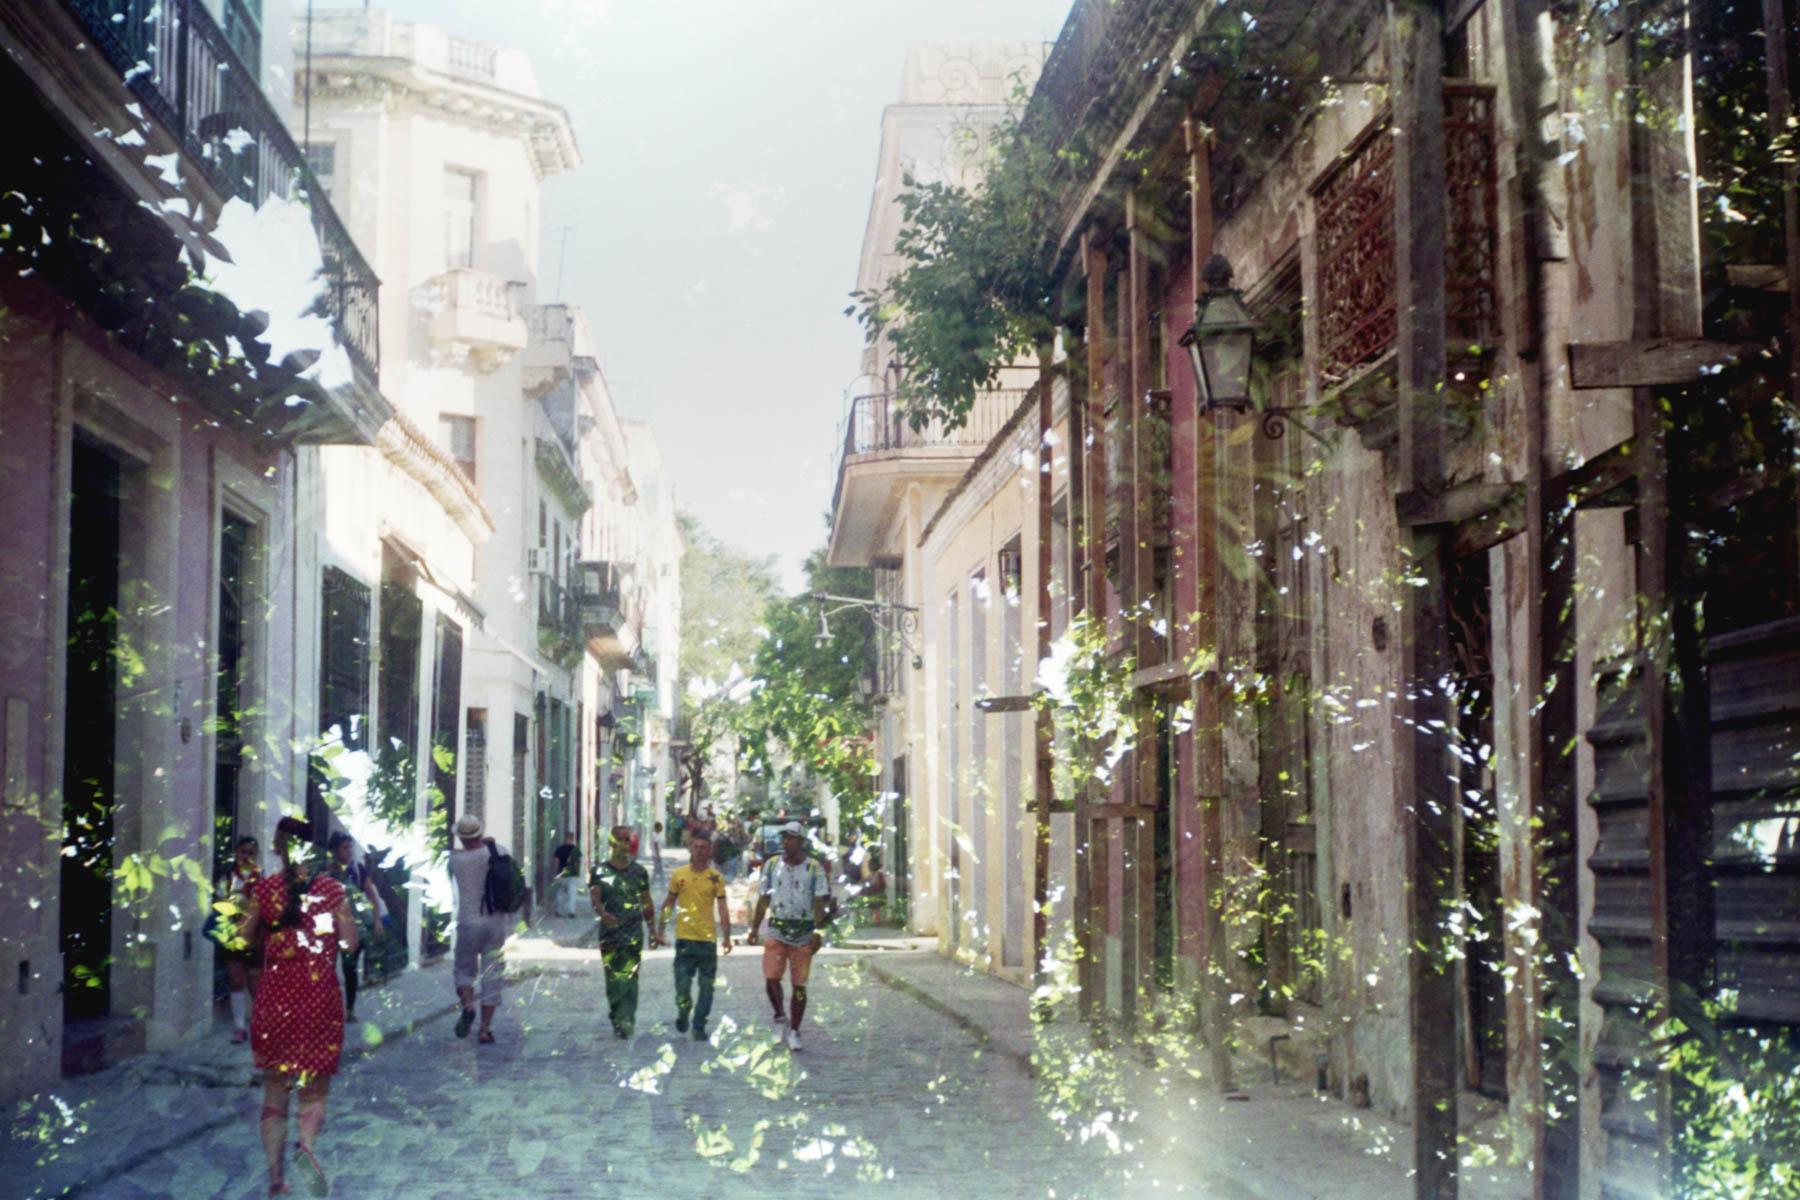 MM 129 - Old Havana, Cuba